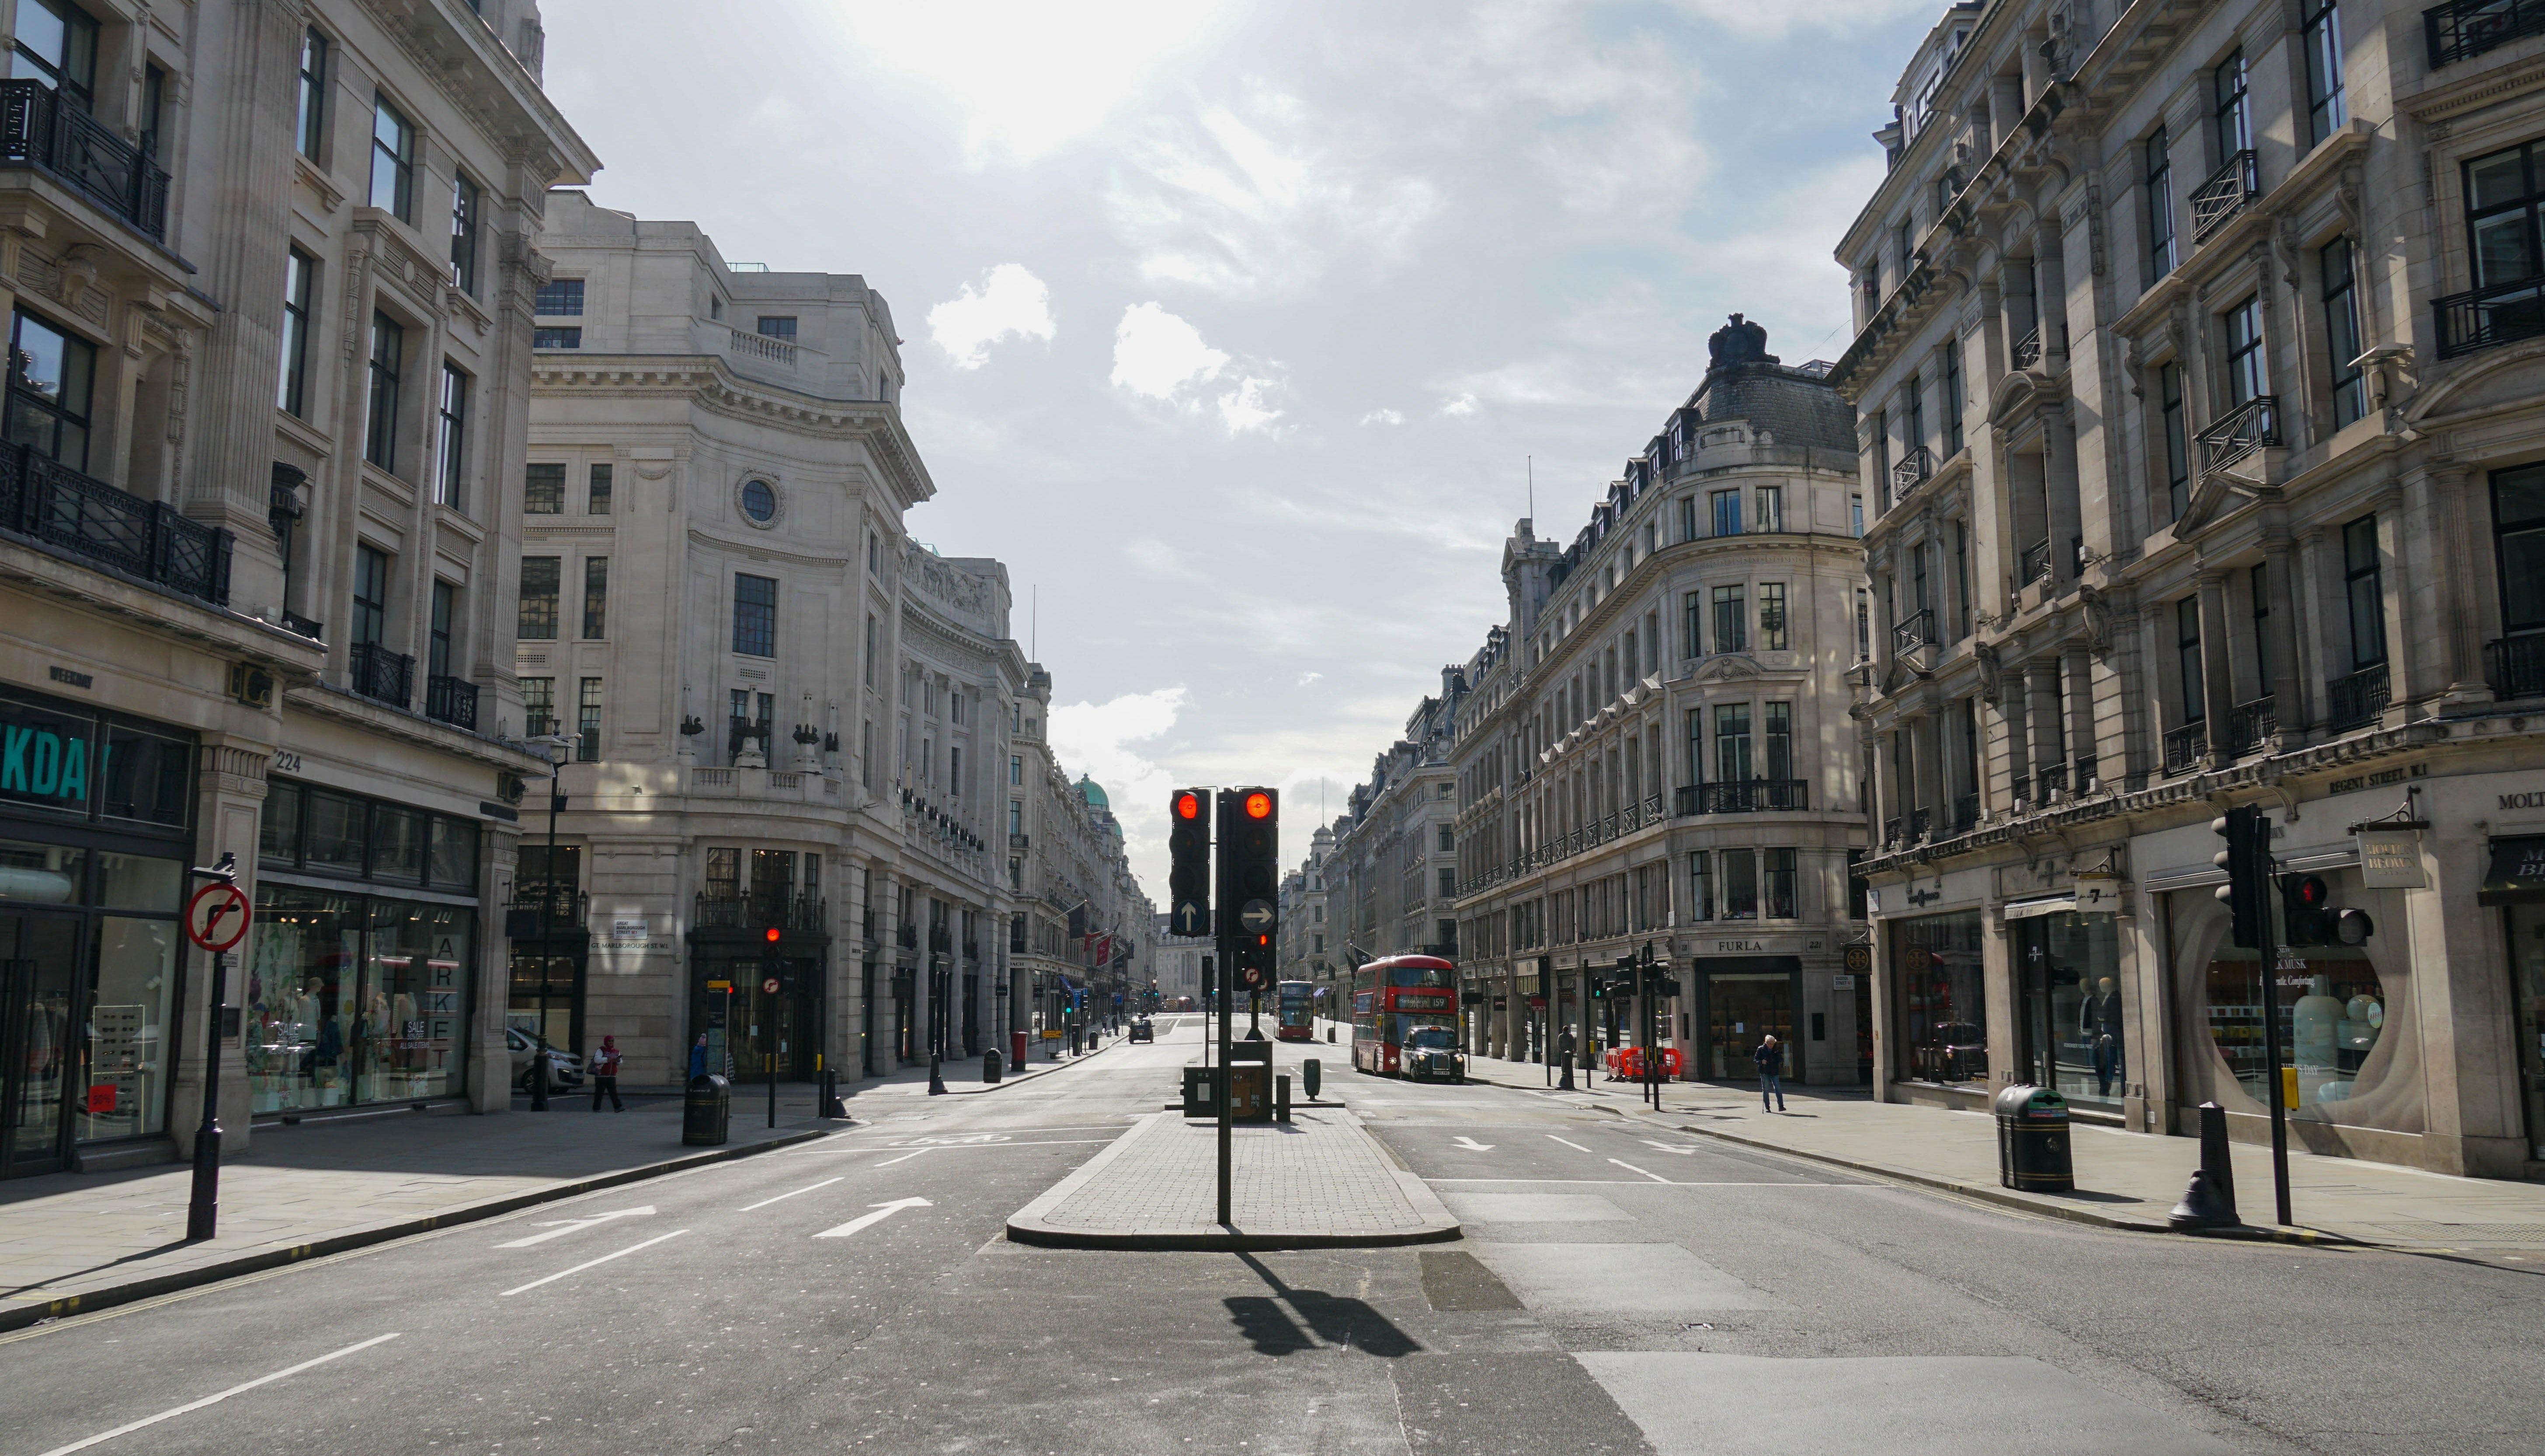 London's Oxford Street during lockdown. Shutterstock.